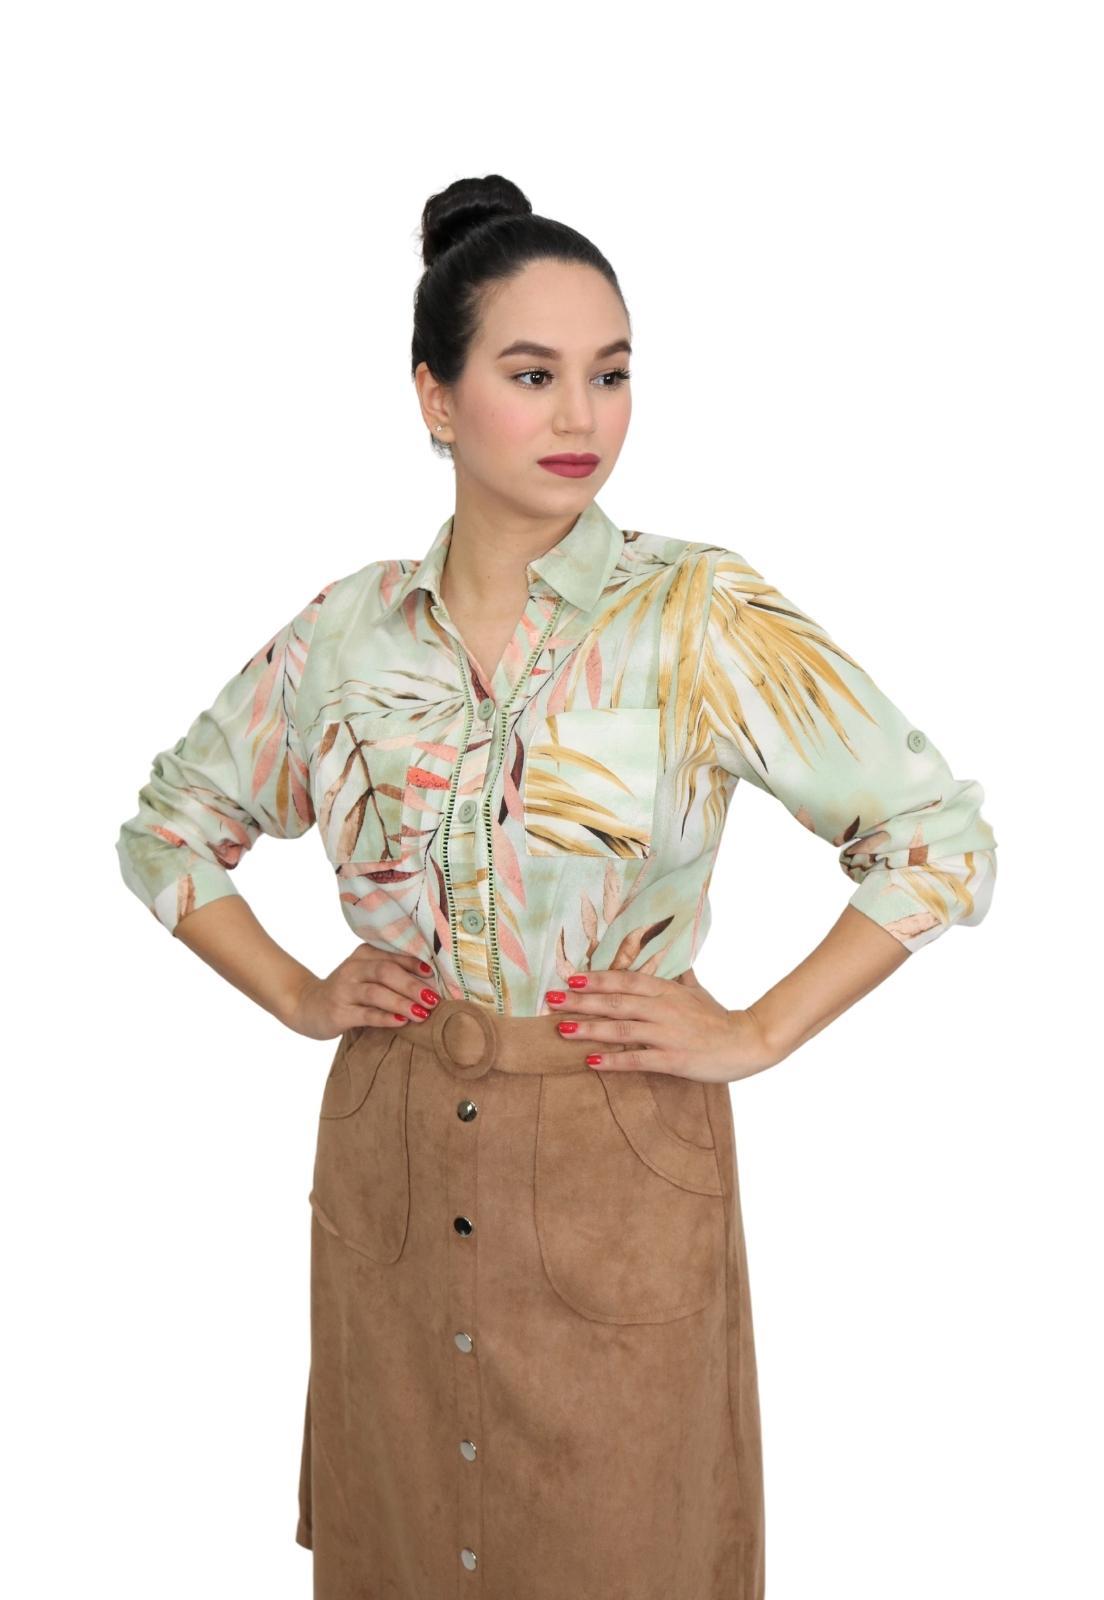 Camisa Feminina Manga Longa Estampa Folhas